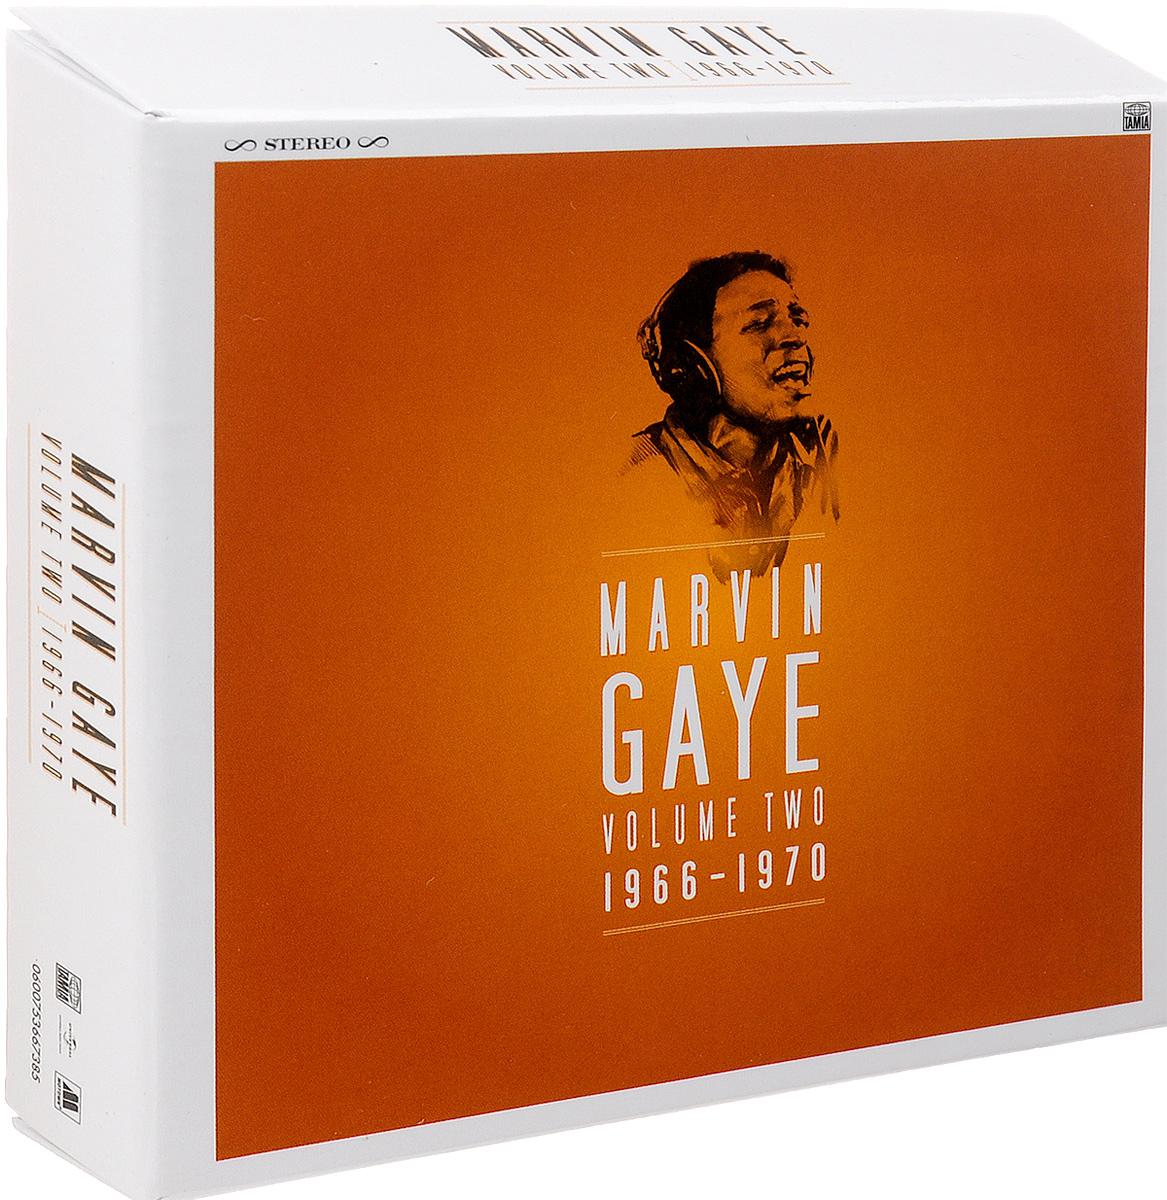 лучшая цена Марвин Гэй,Ким Уэстон,Тамми Тэррелл Marvin Gaye. Volume Two. 1966 - 1970 (8 CD)